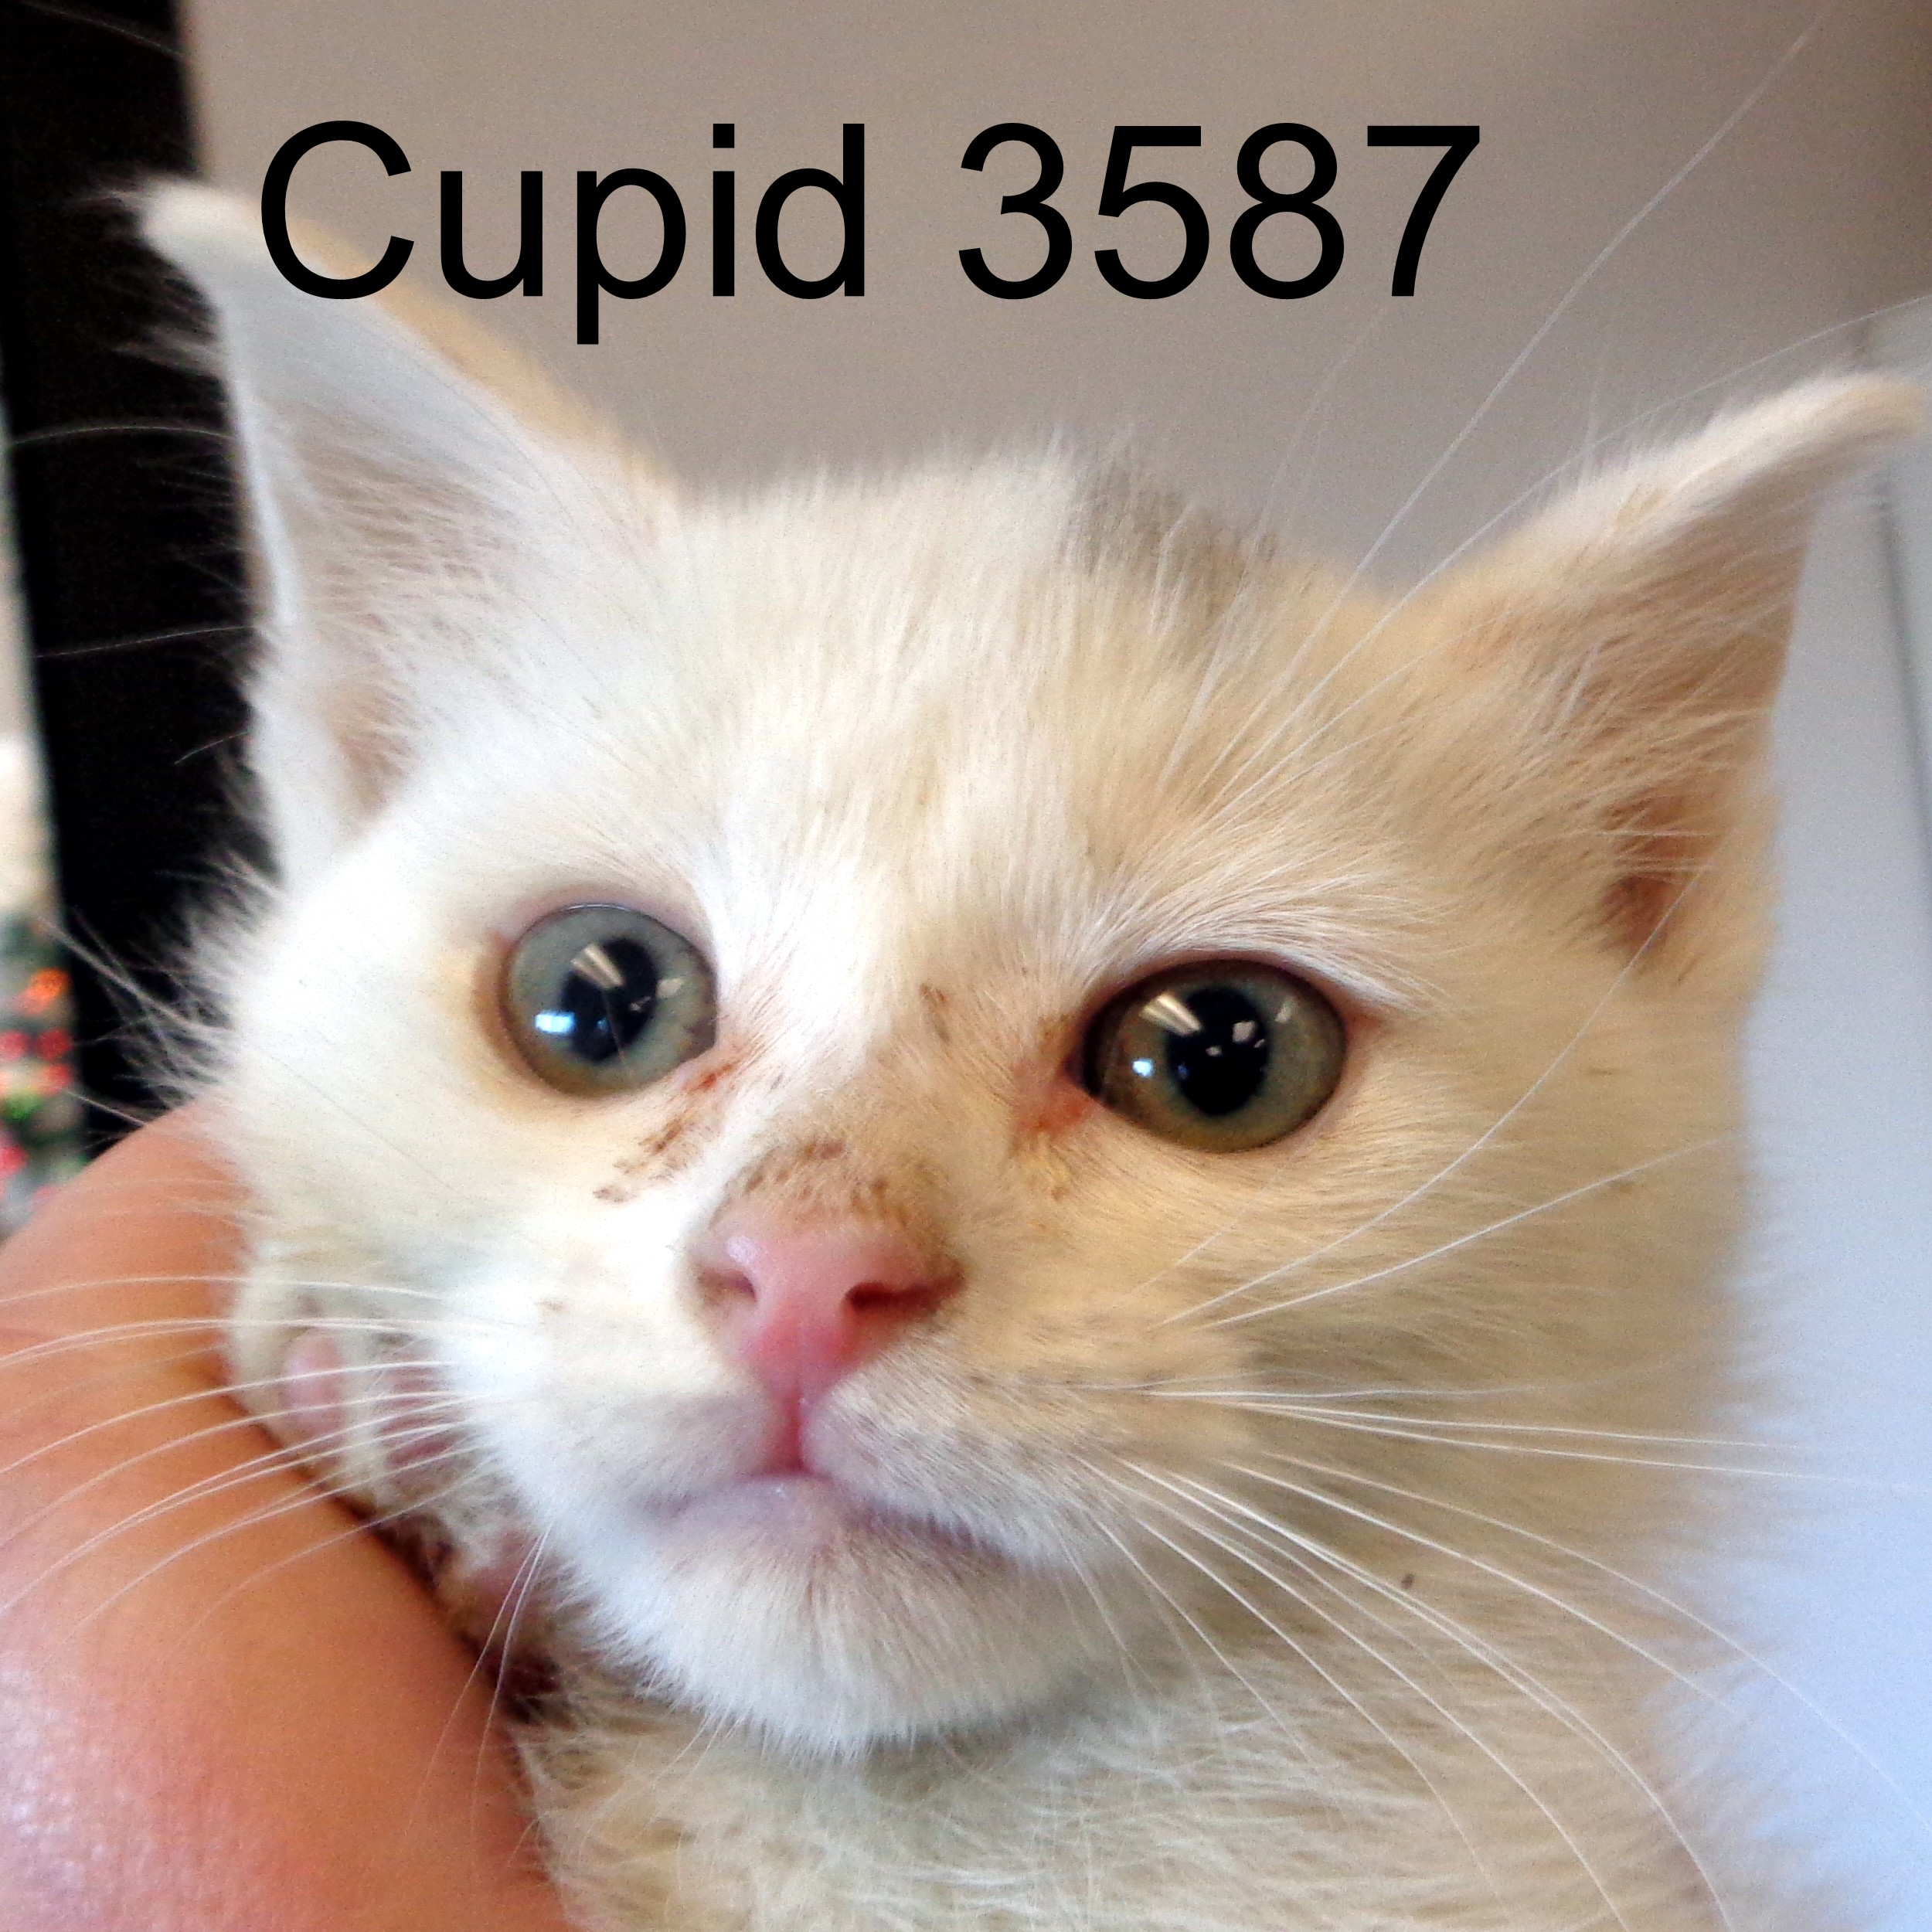 Cupid 3587.JPG